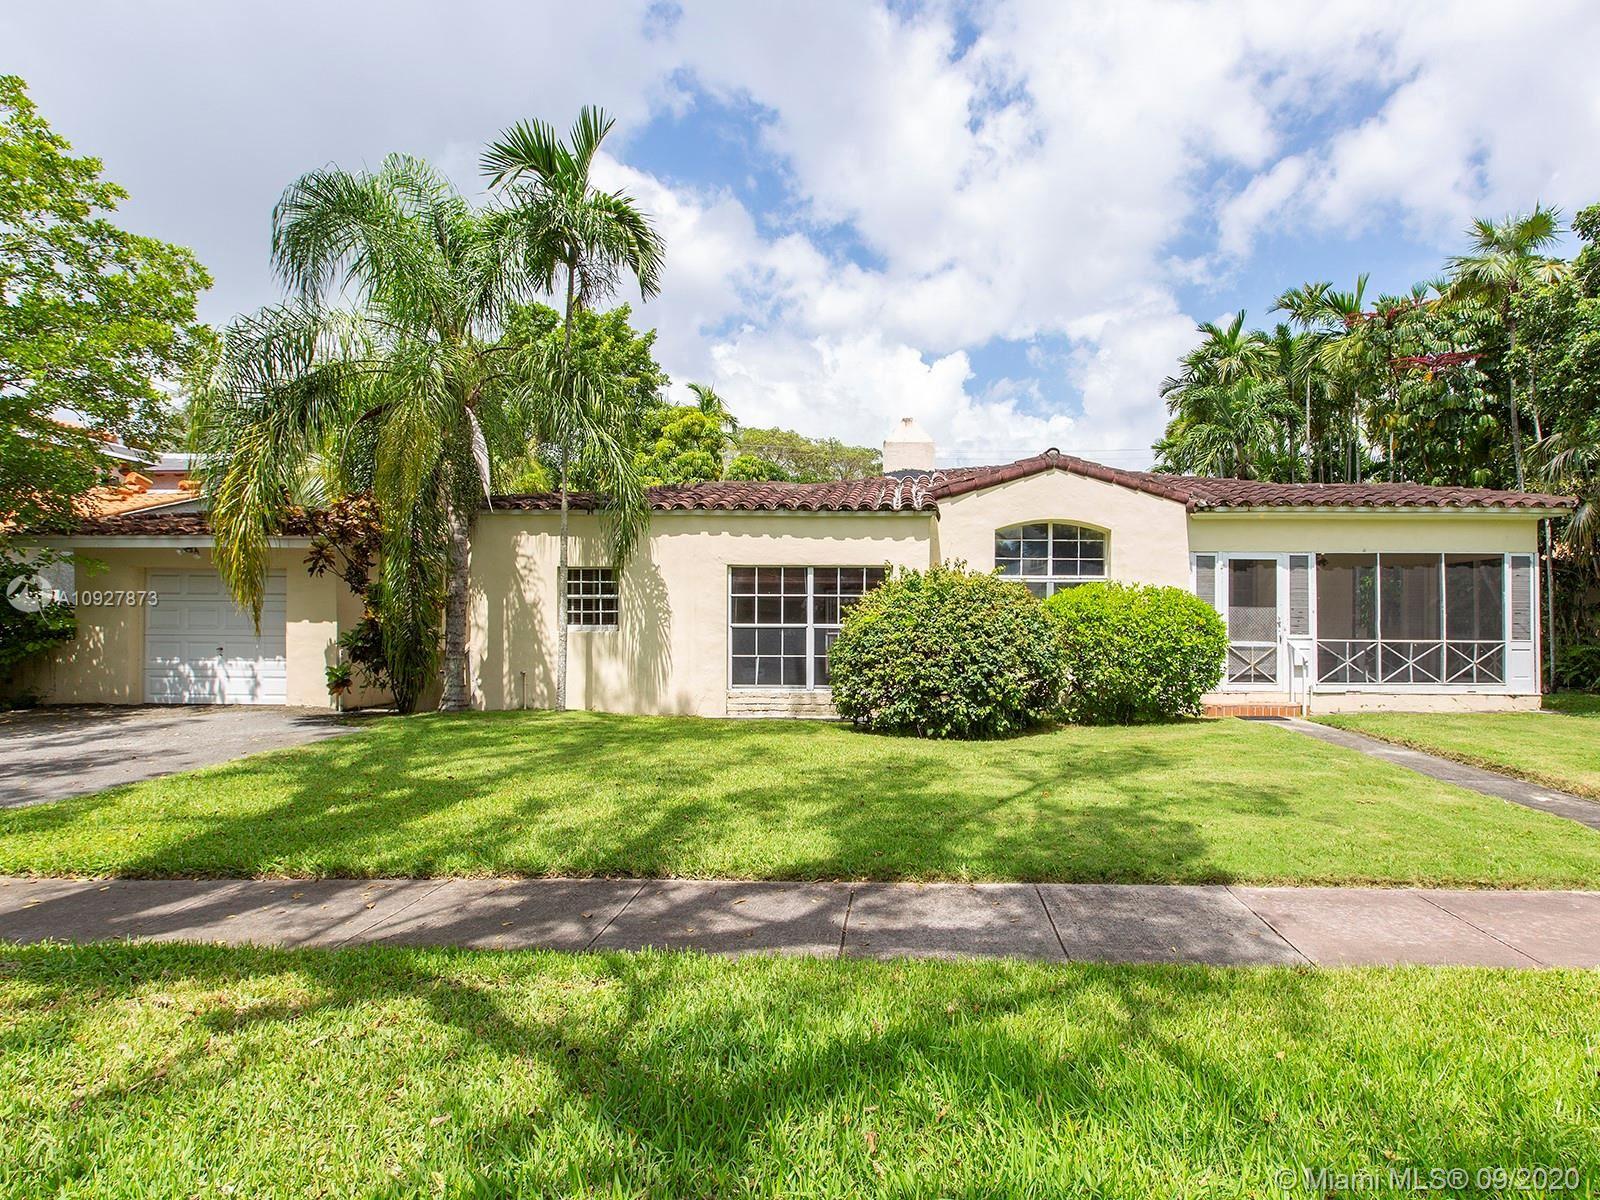 737 Minorca Ave, Coral Gables, FL 33134 - #: A10927873